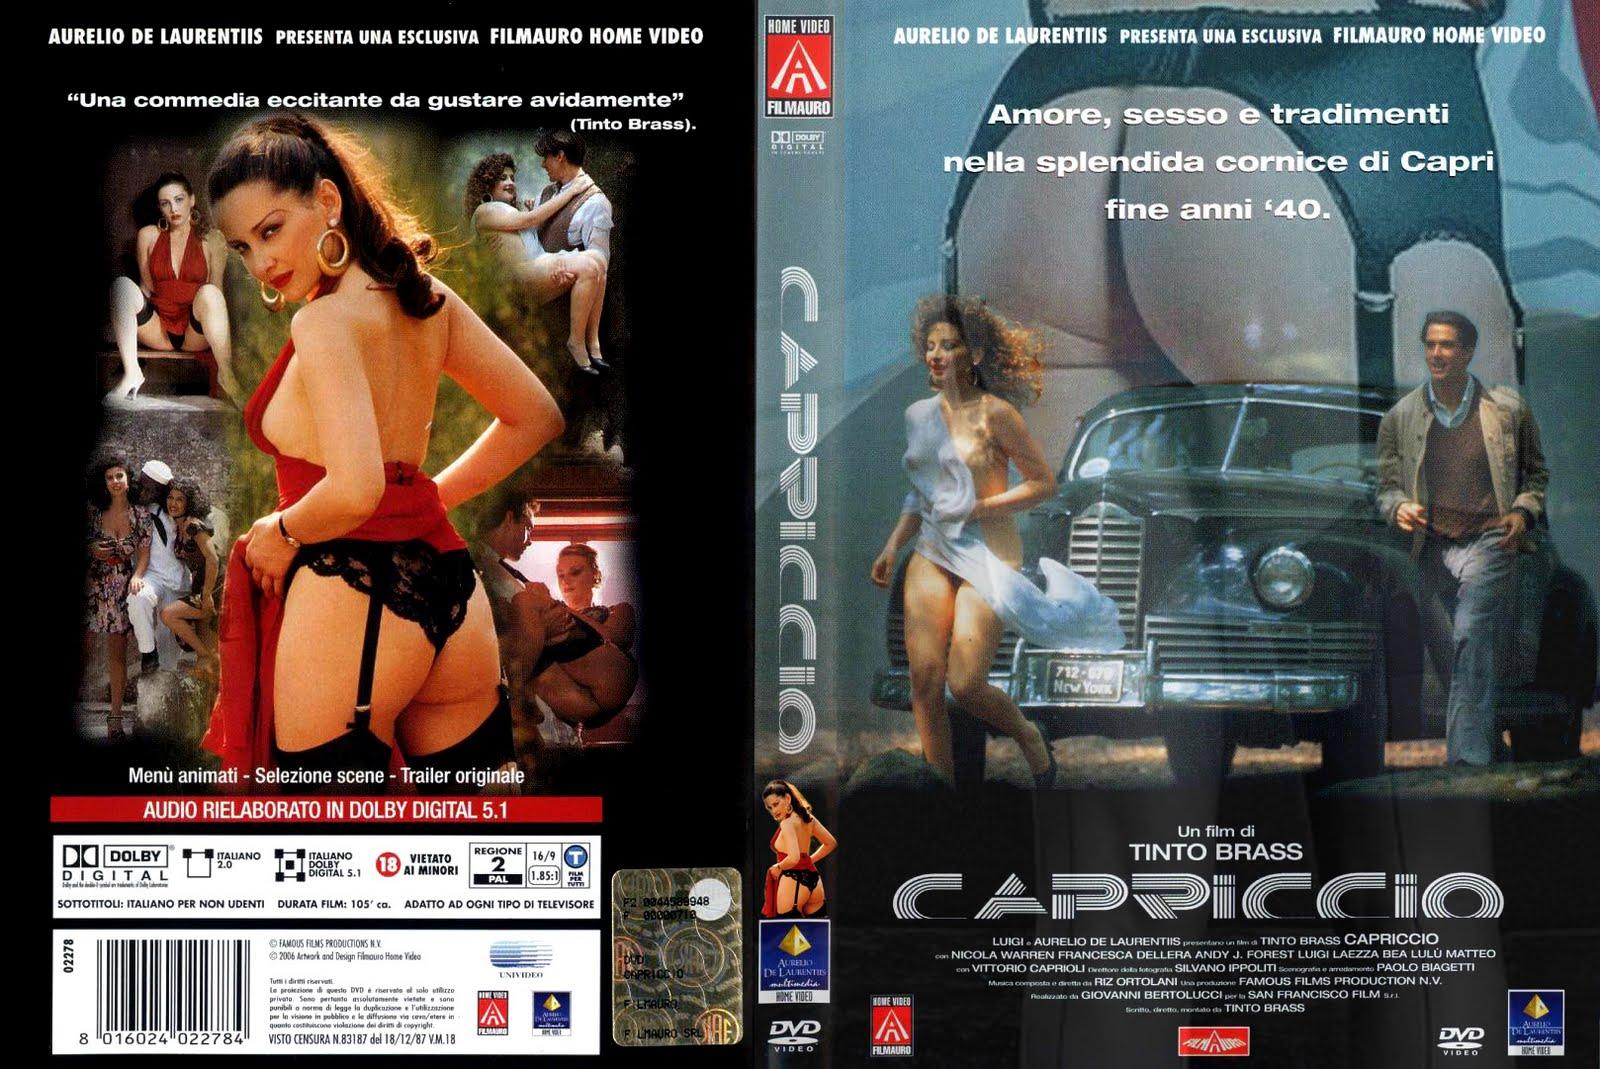 eroticheskie-filmi-s-subtitrami